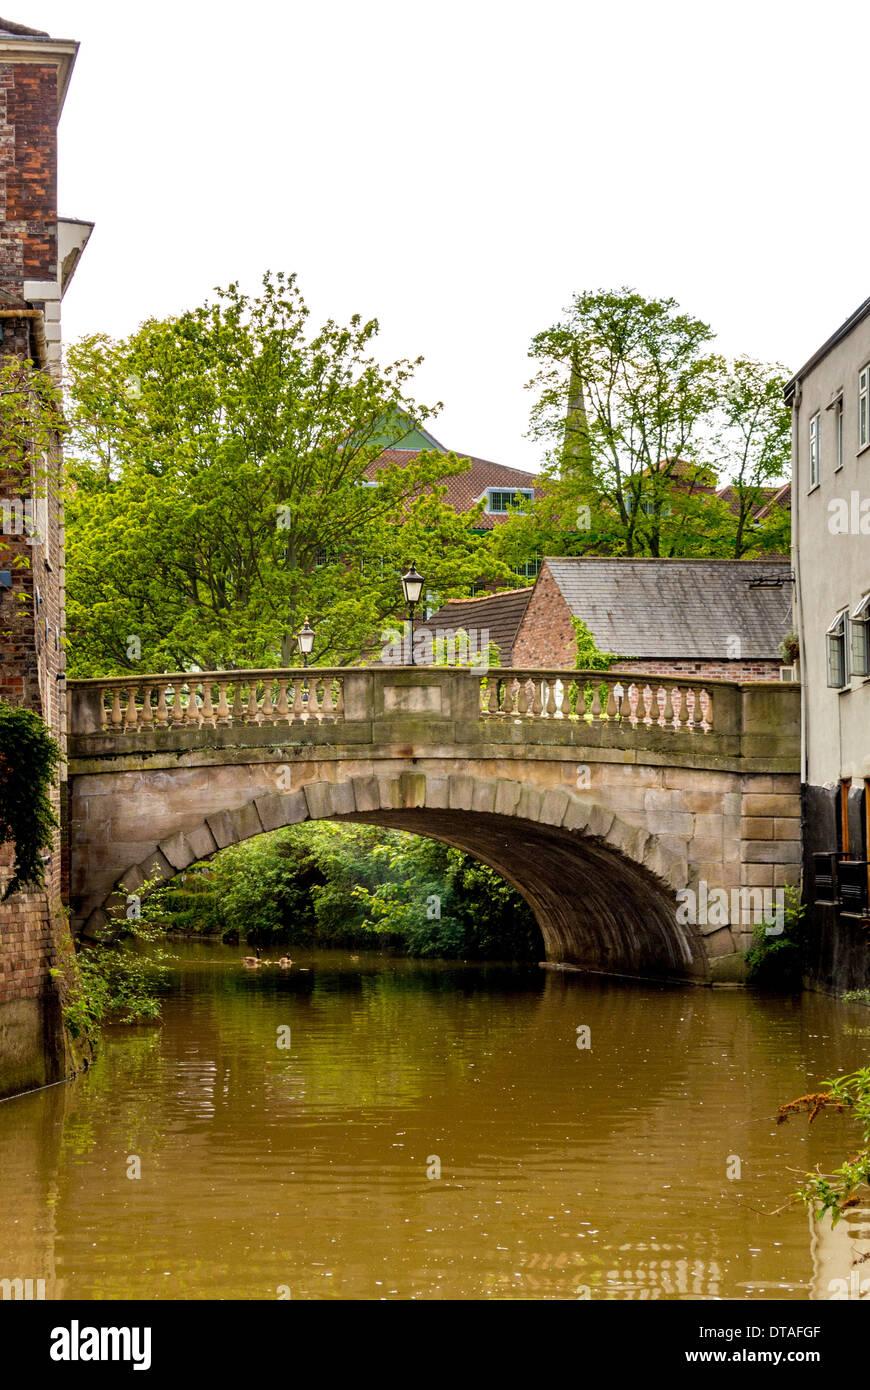 Fossgate Bridge over River Foss, York. - Stock Image